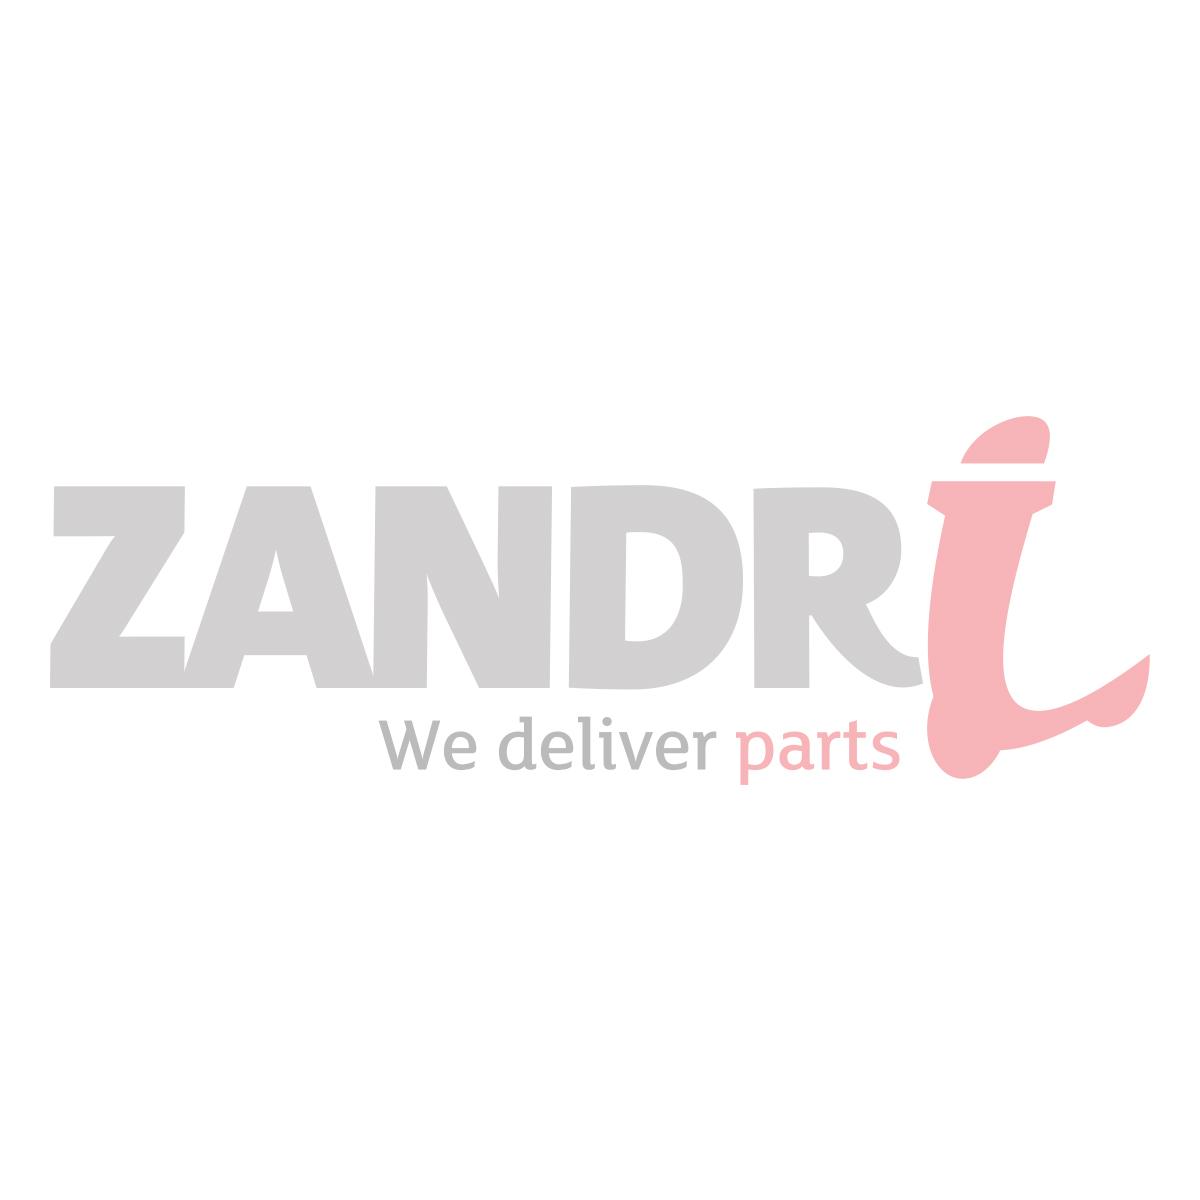 carburateur bali/dink/jet/scoopy/sfx/sni/sr2000/tb/x8r 17.5mm dellorto